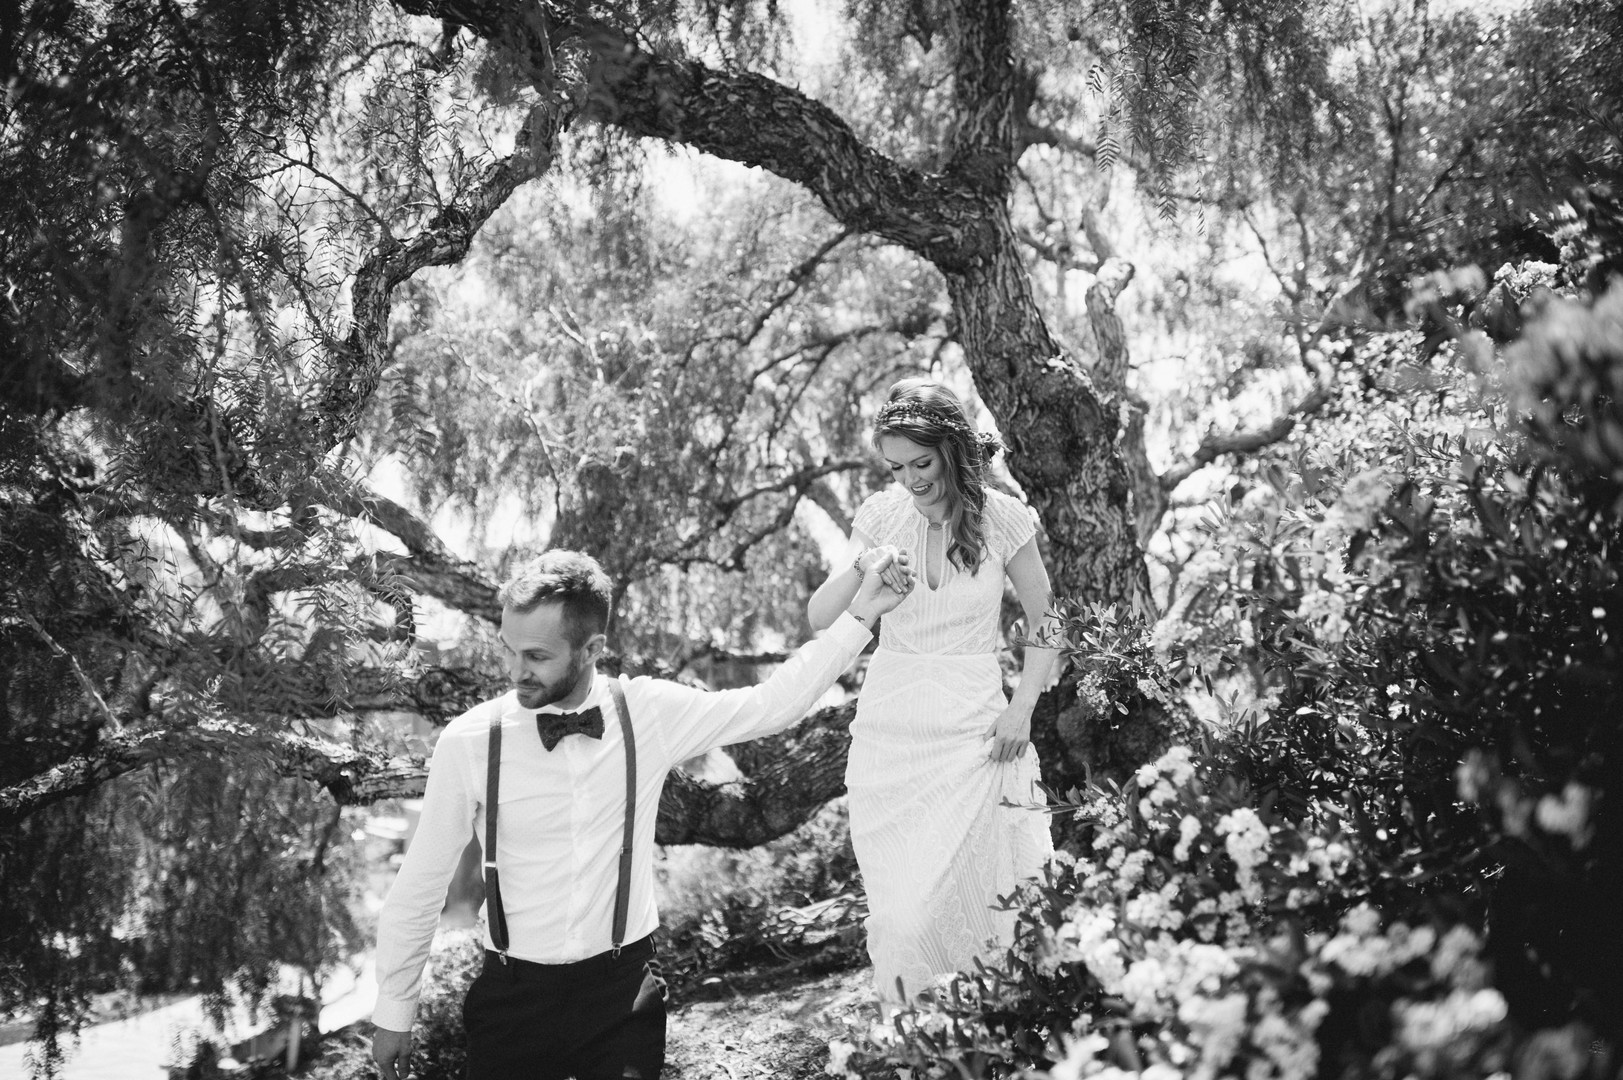 www.santabarbarawedding.com   Sarah Katherine Davis Photography   Santa Barbara Museum of Natural History   Wild Heart Events   BHLDN   Bride and Groom Among the Trees